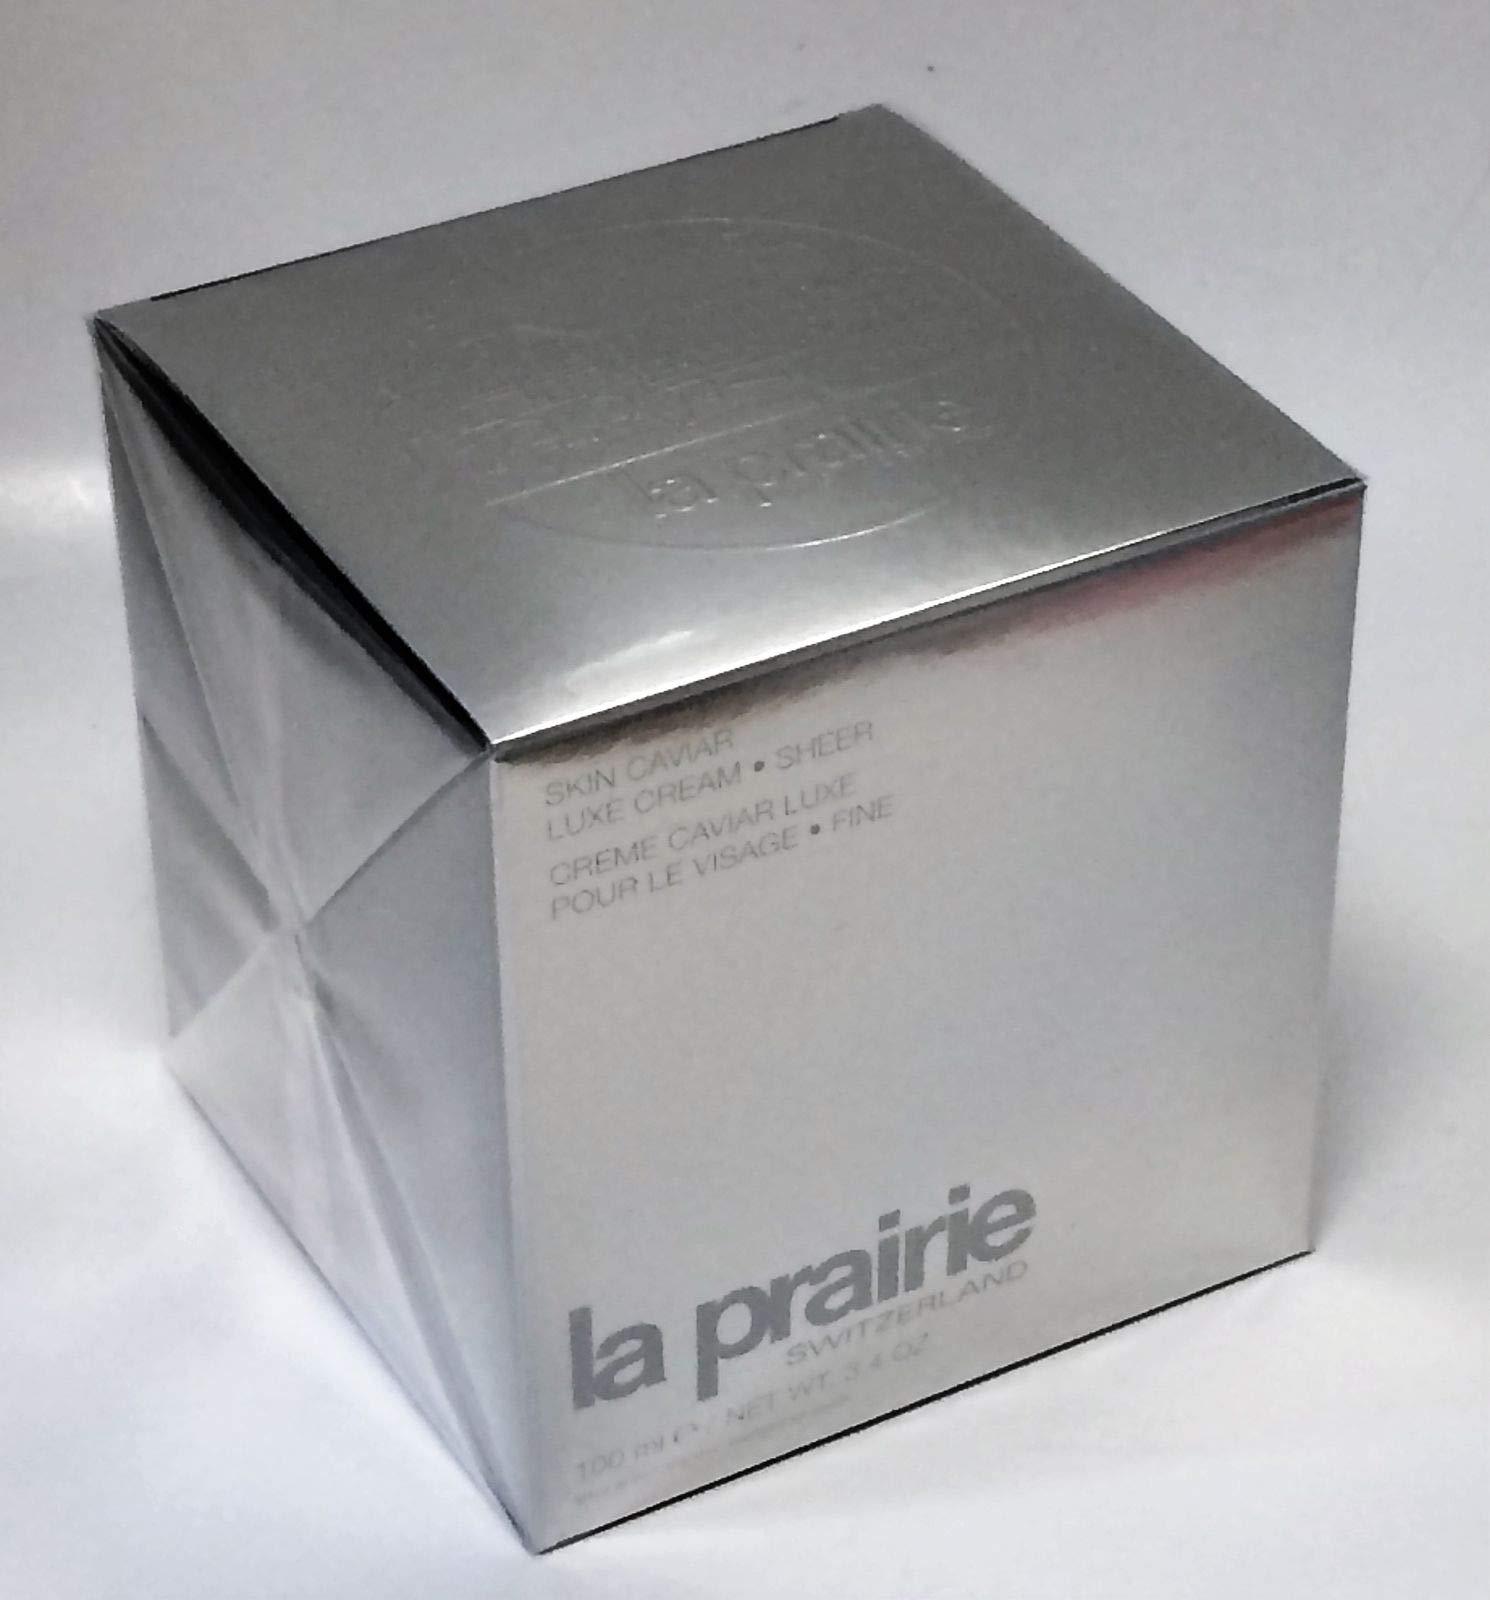 La Prairie Skin Caviar Luxe Cream Sheer 100 ml 3.4 oz